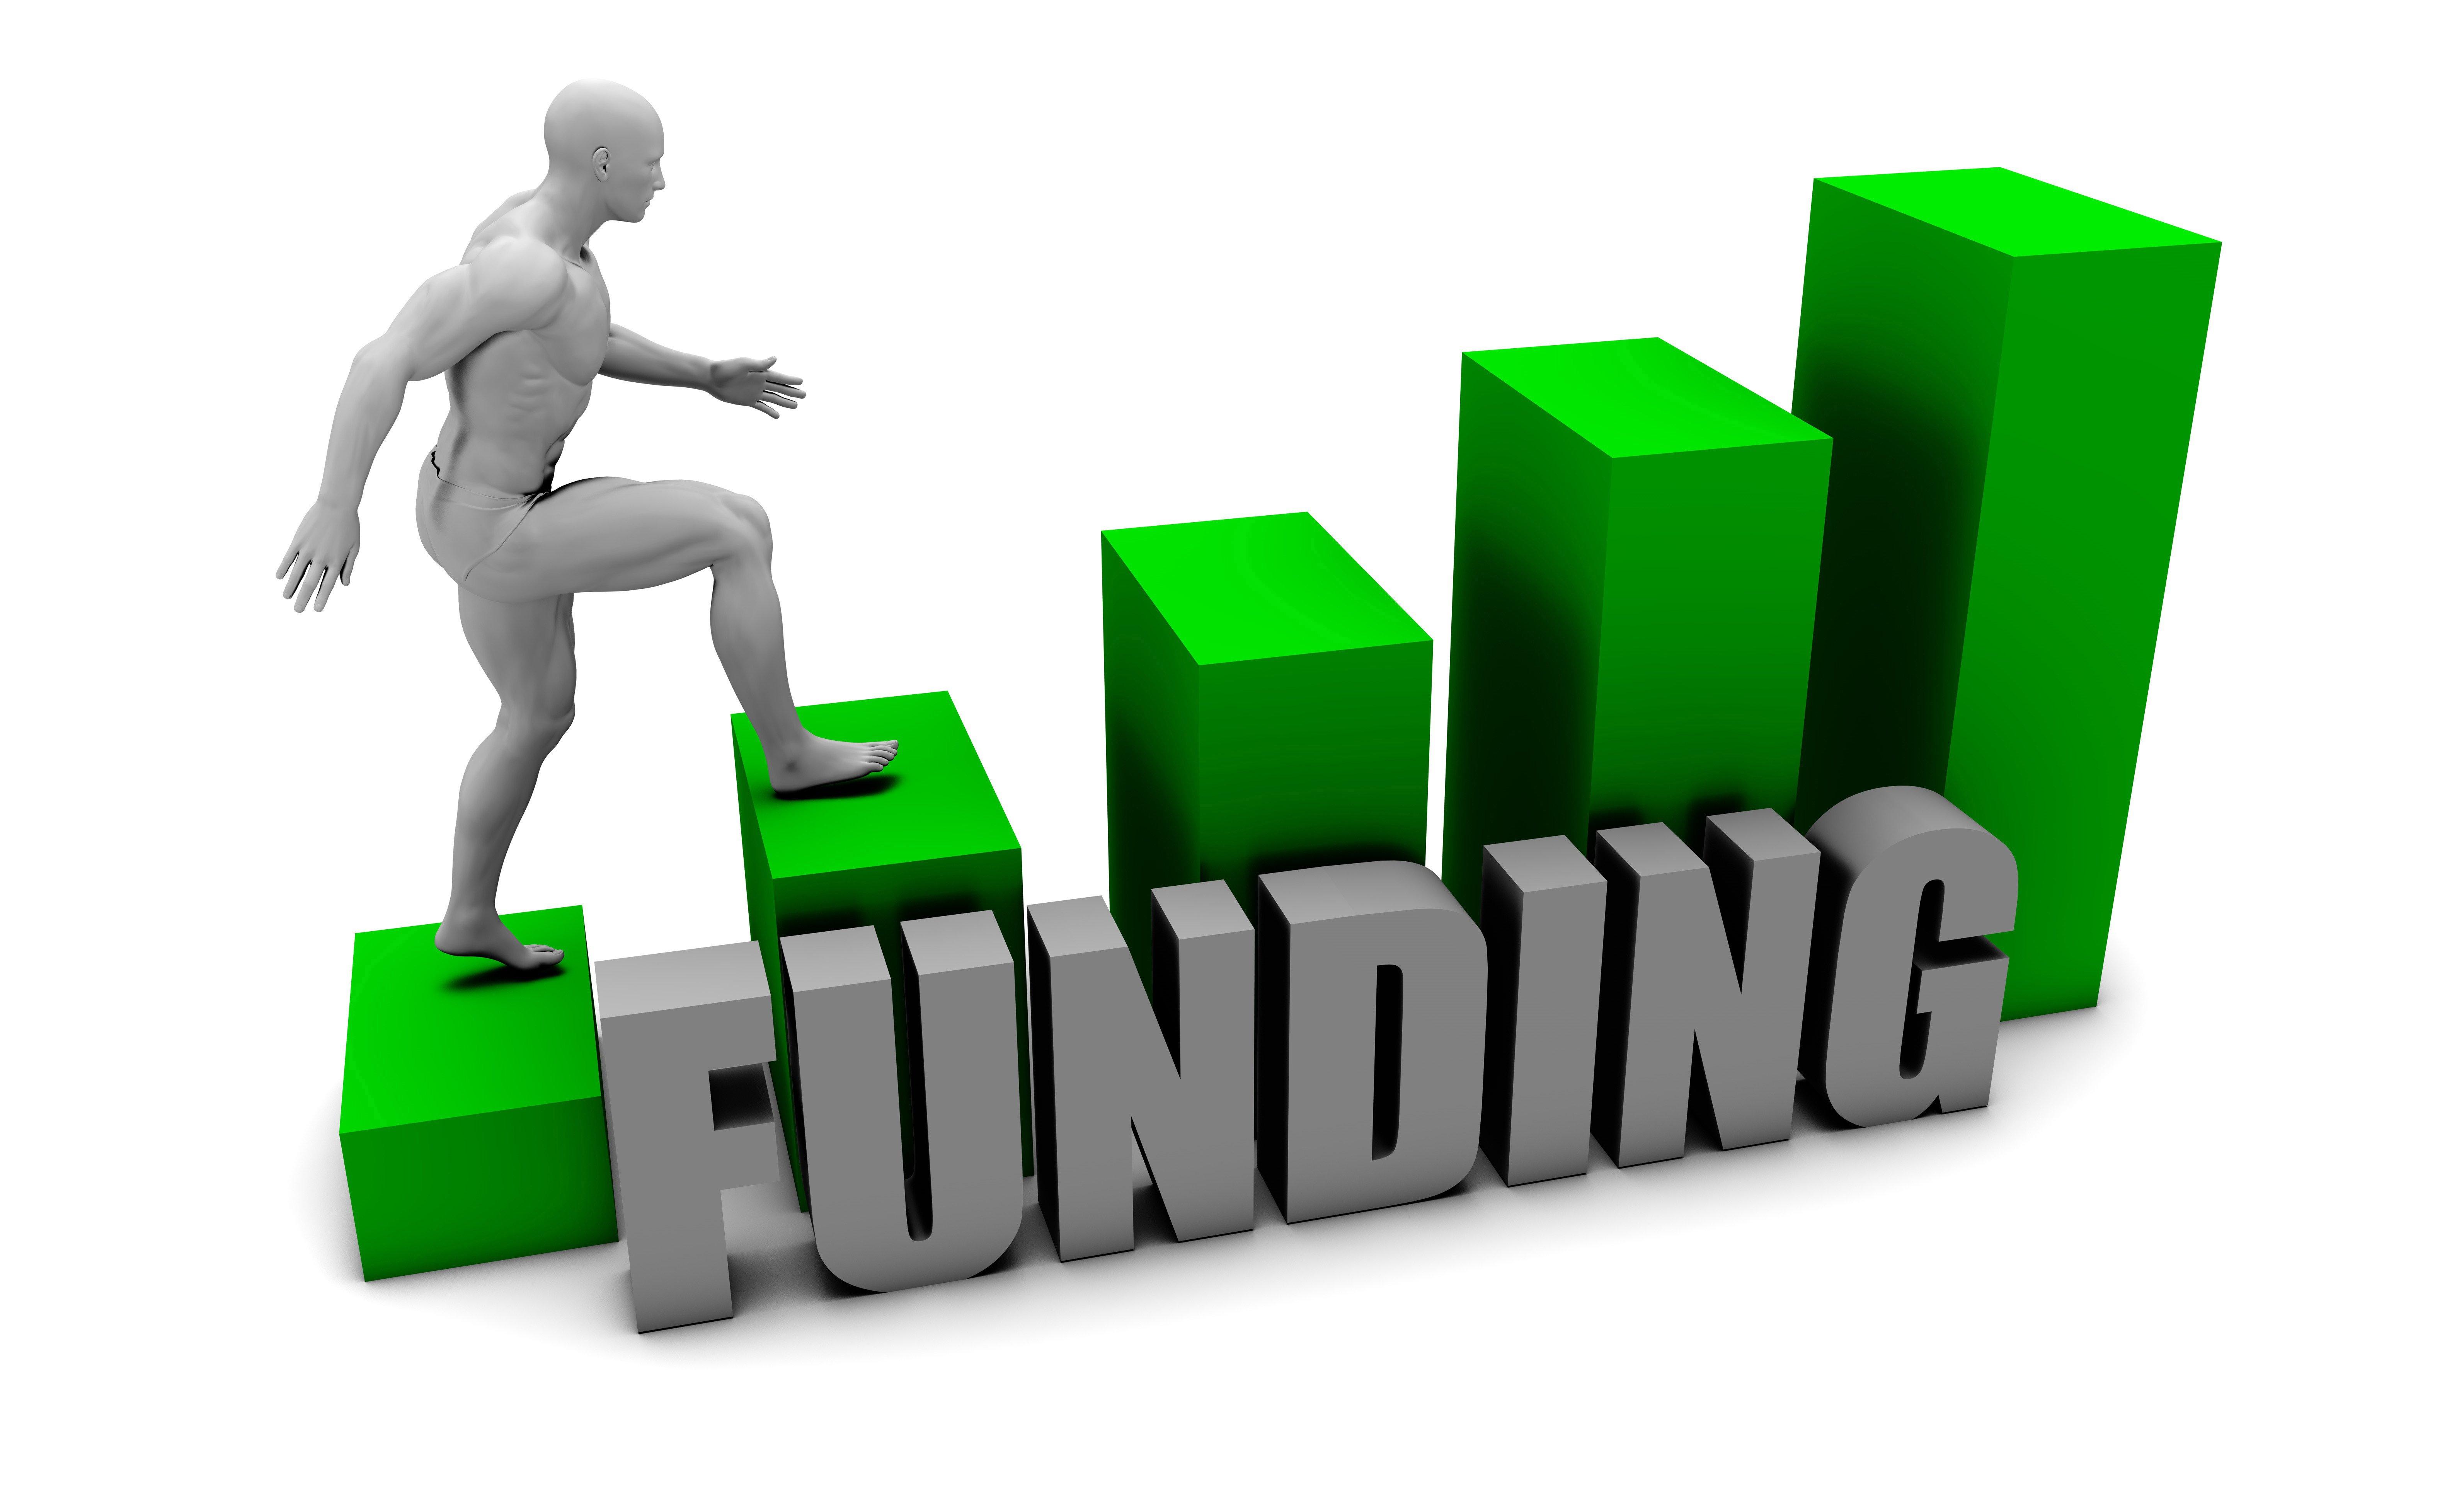 Building a Future through Fundraising